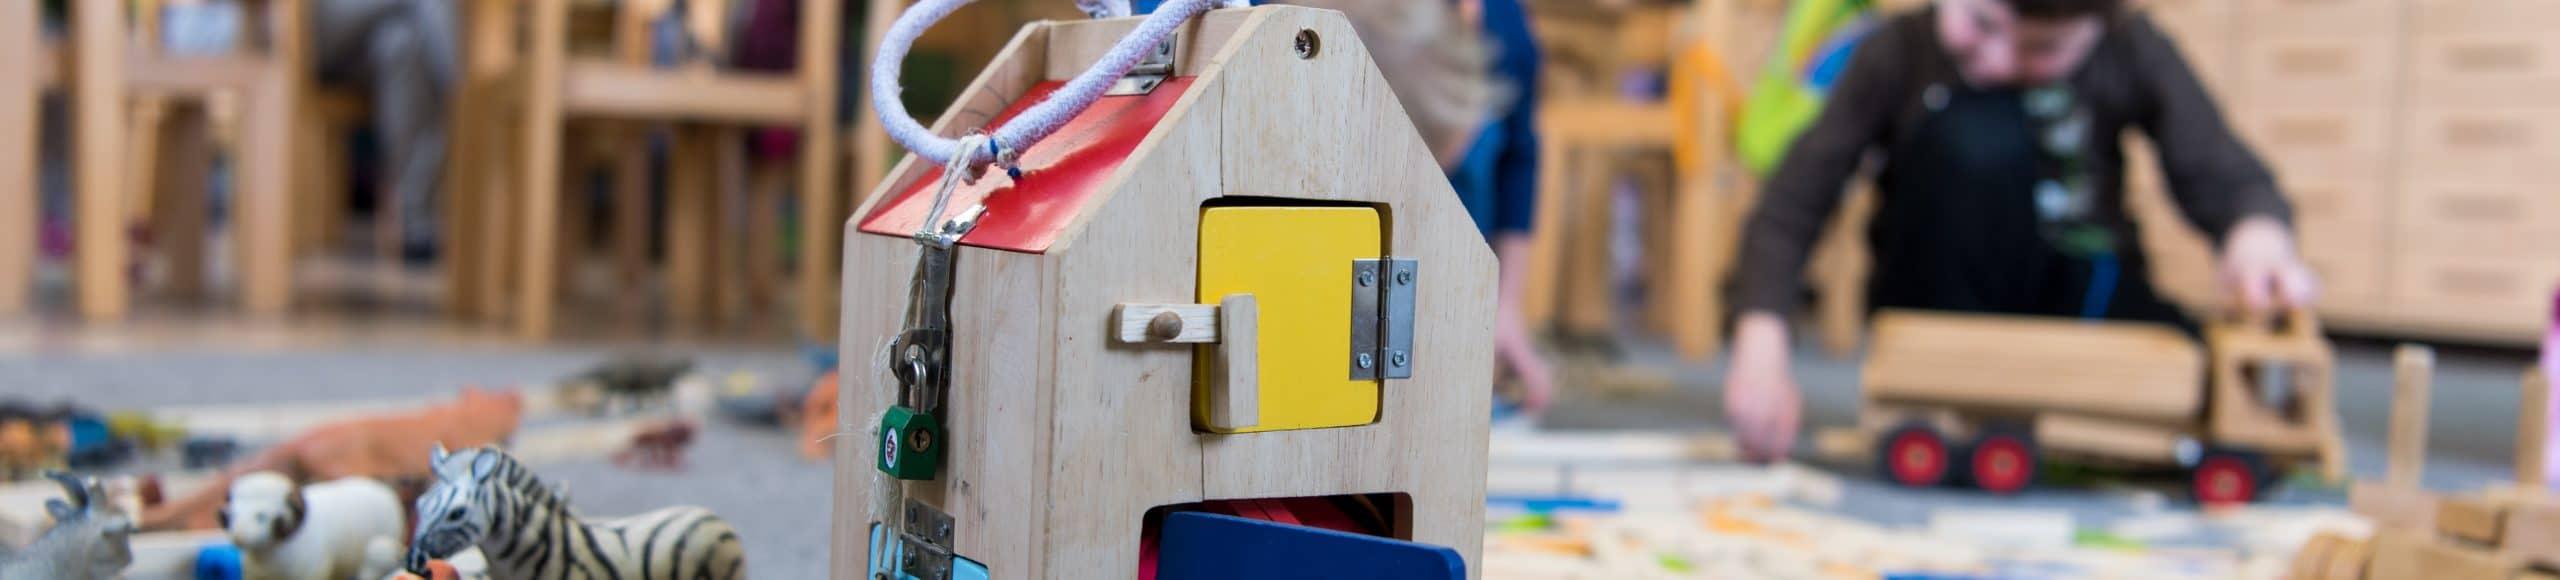 Kind Kindergarten frühkindliche Bildung Kita